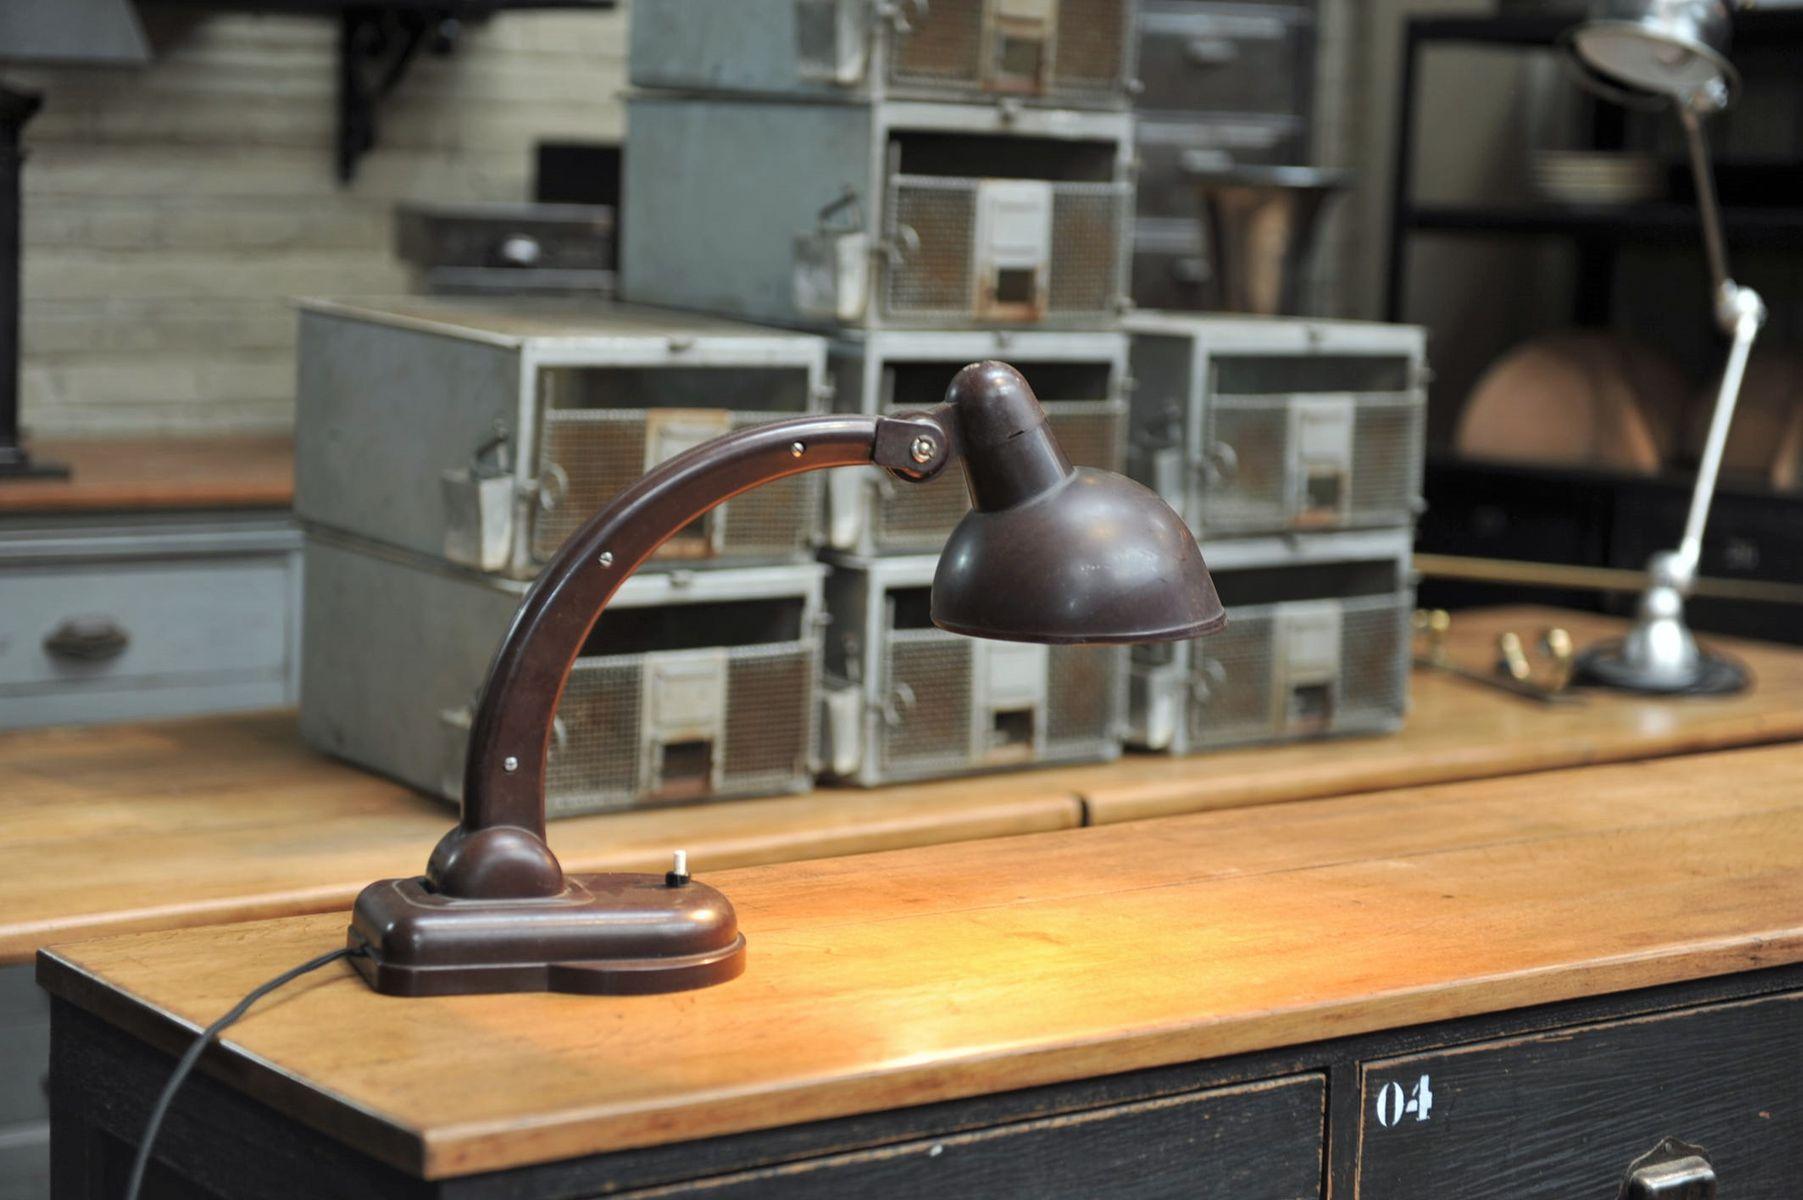 Lampe de bureau articul e en bak lite france 1930s en - Lampe de bureau articulee ...